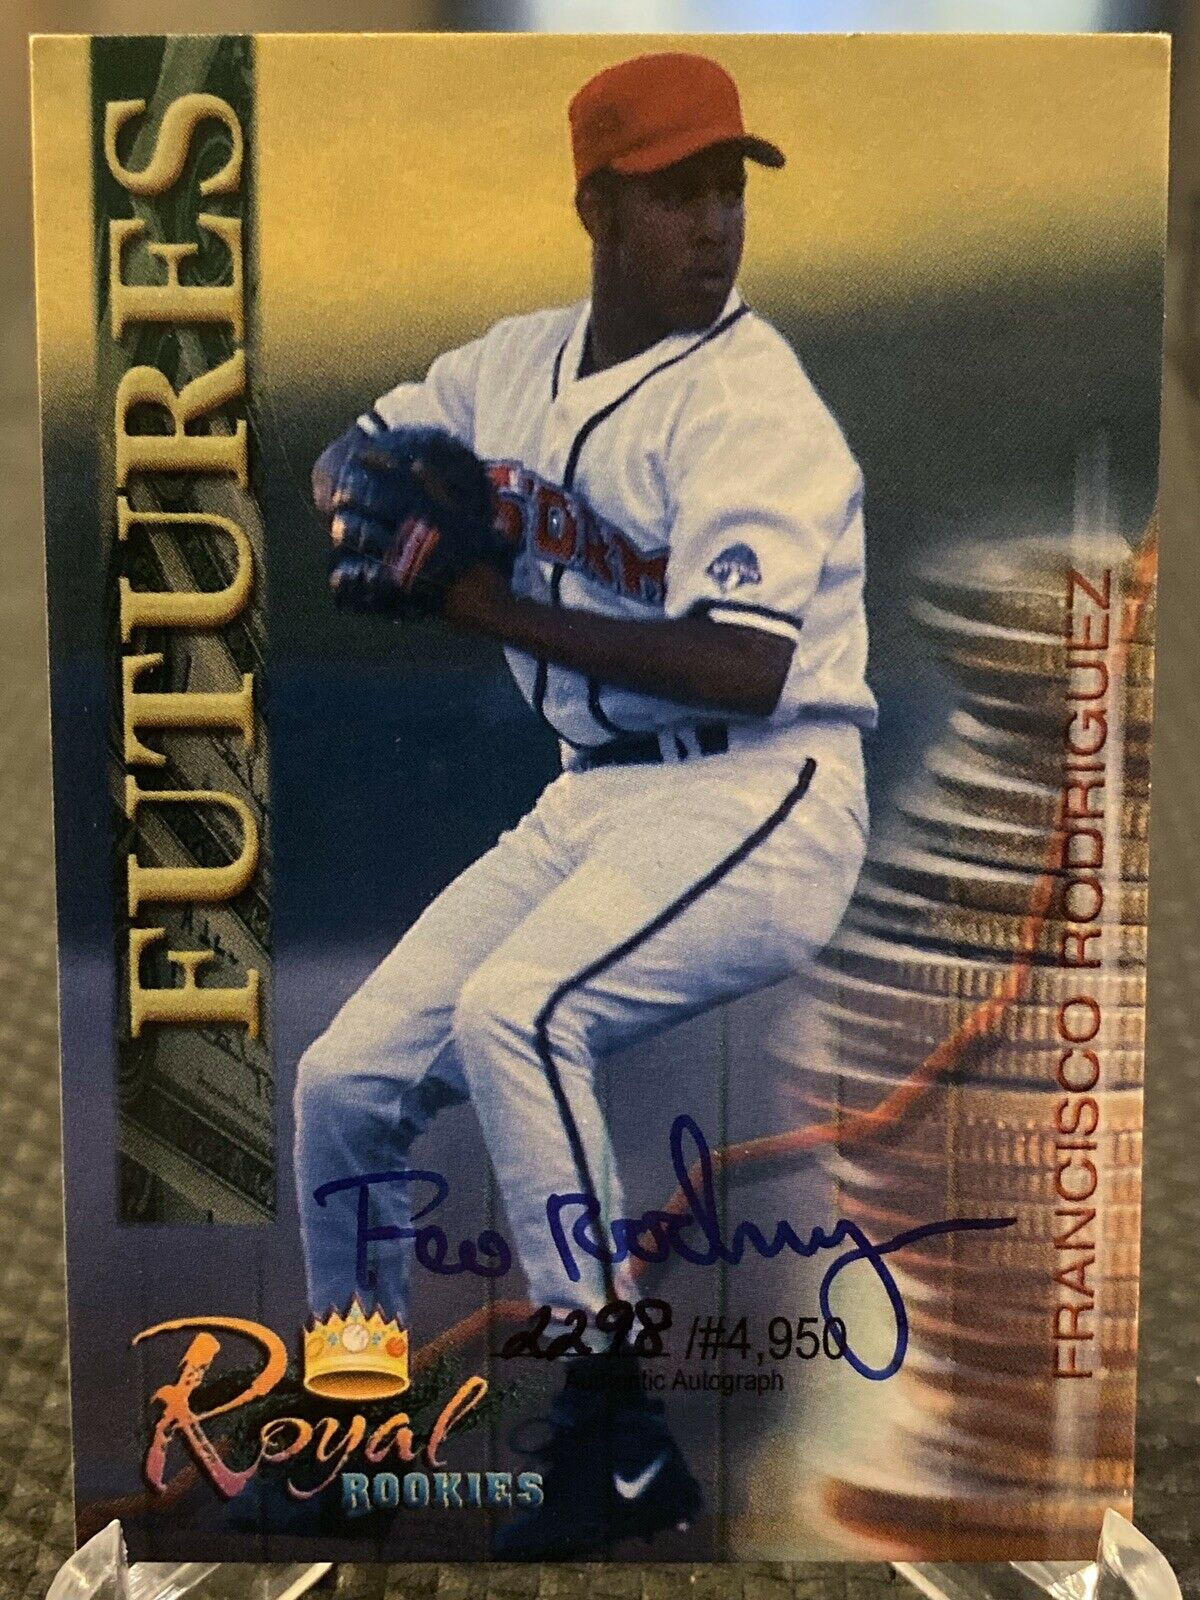 Francisco Rodriguez -K-Rod- 2000 Royal Rookies Futures Autographs #34 2298/4950